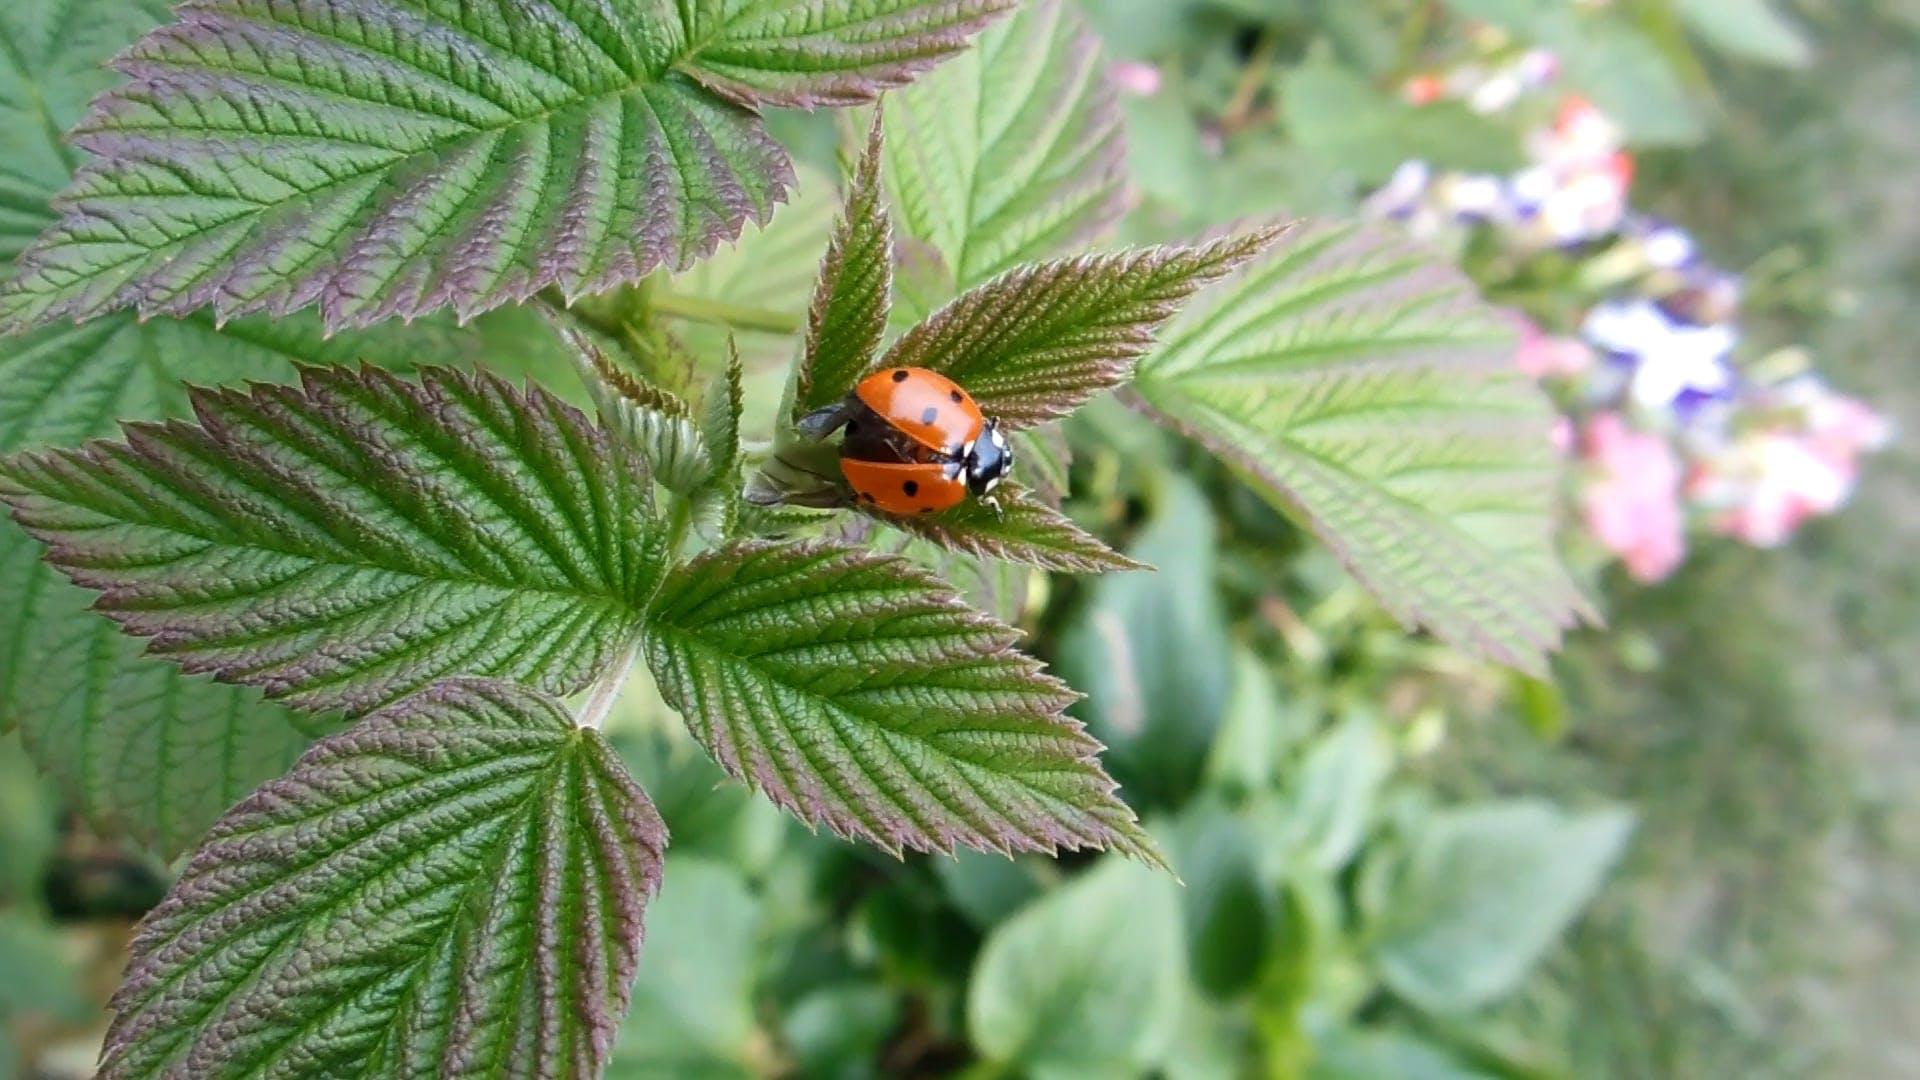 A Cute Ladybug Testing Her Wings